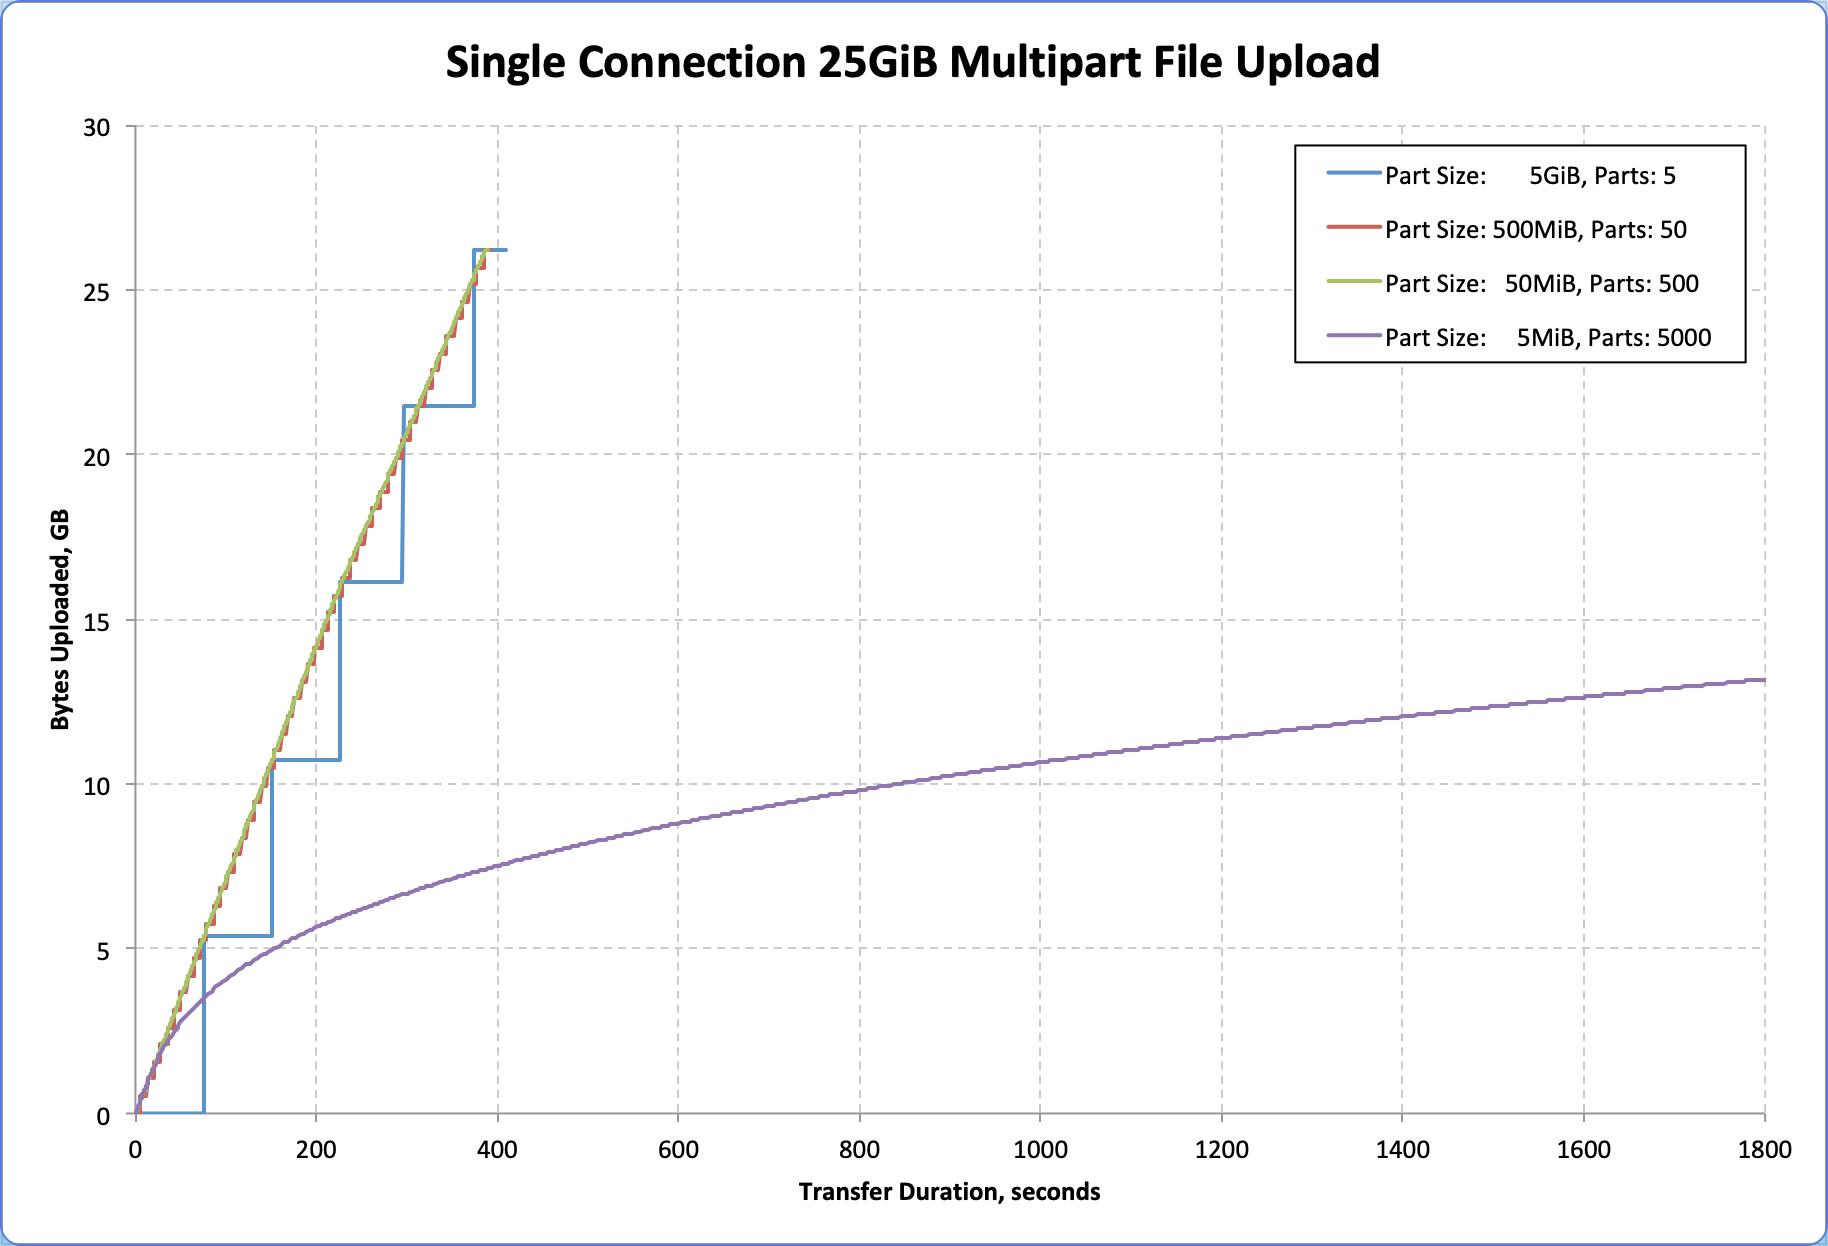 multipart upload throughput approaches